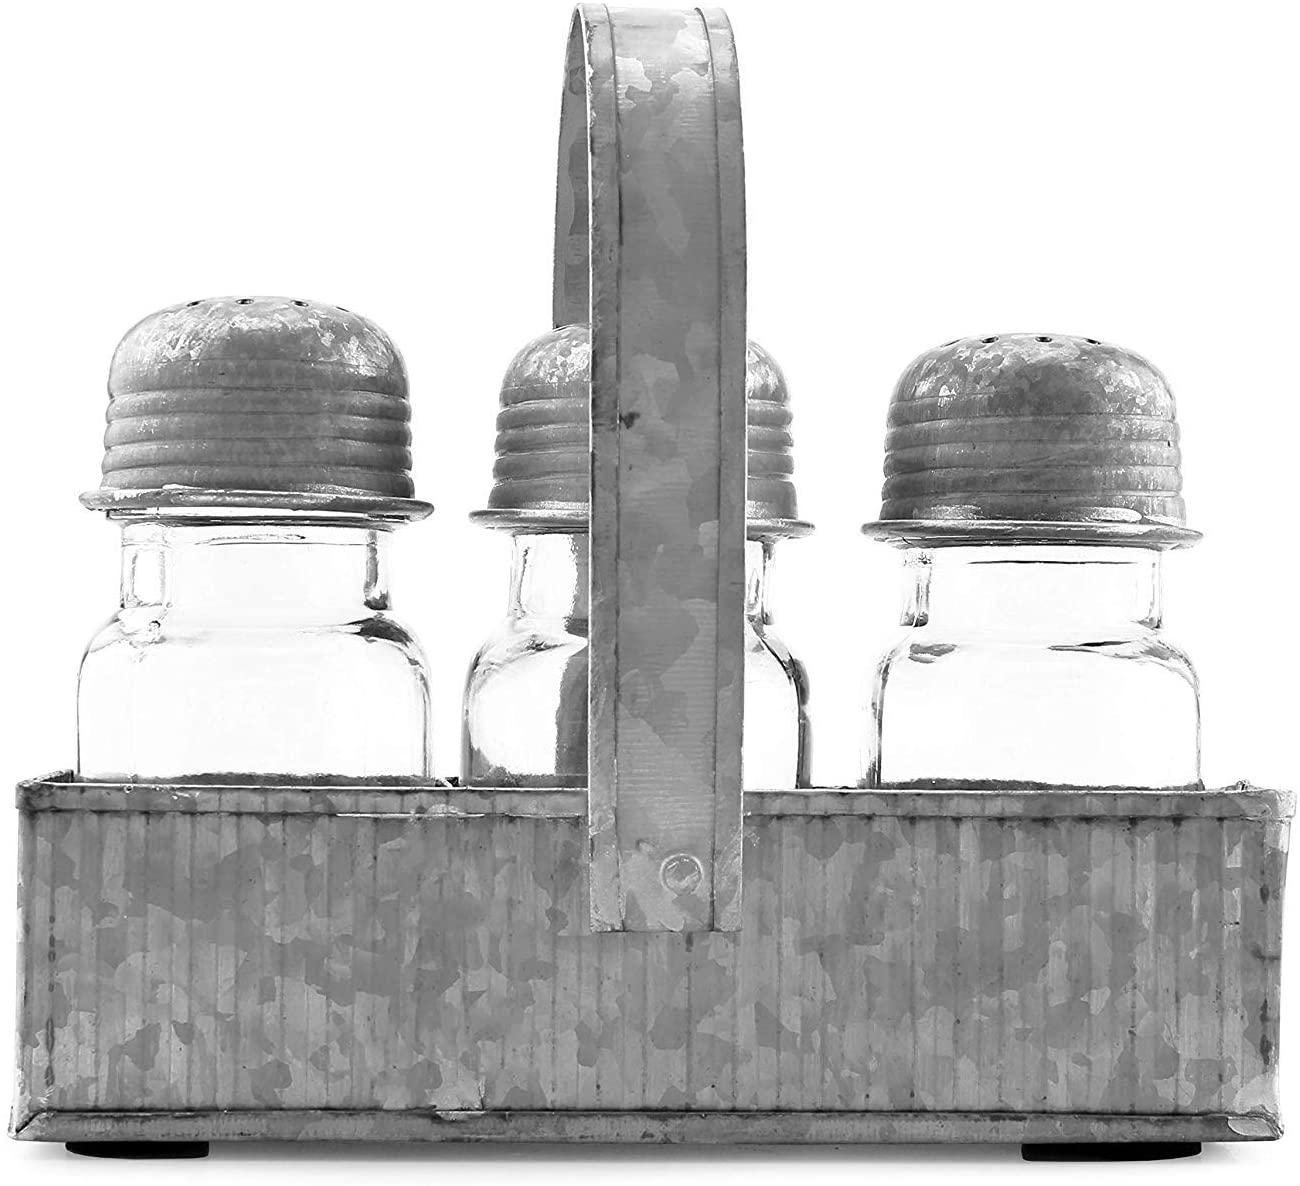 AuldHome Salt and Pepper Shaker Set (4-Piece Set); Farmhouse Galvanized Retro Vintage Style Shaker Set with Caddy